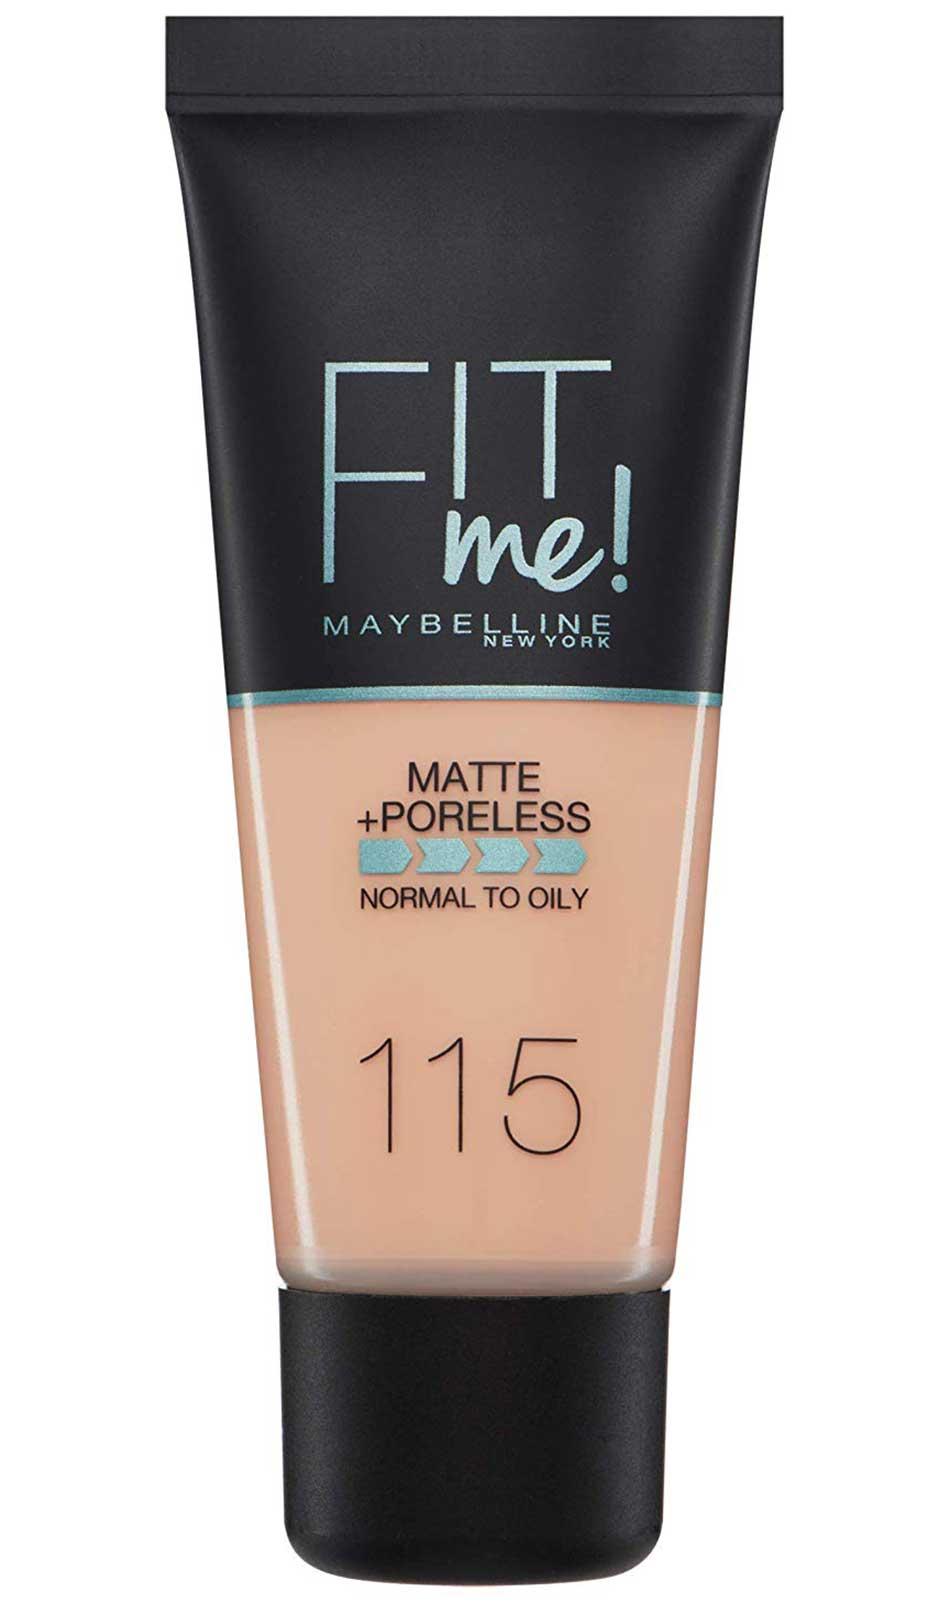 Maybelline New York Fit Me Matte Poreless 115 Ivory Foundation 30ml Makeup